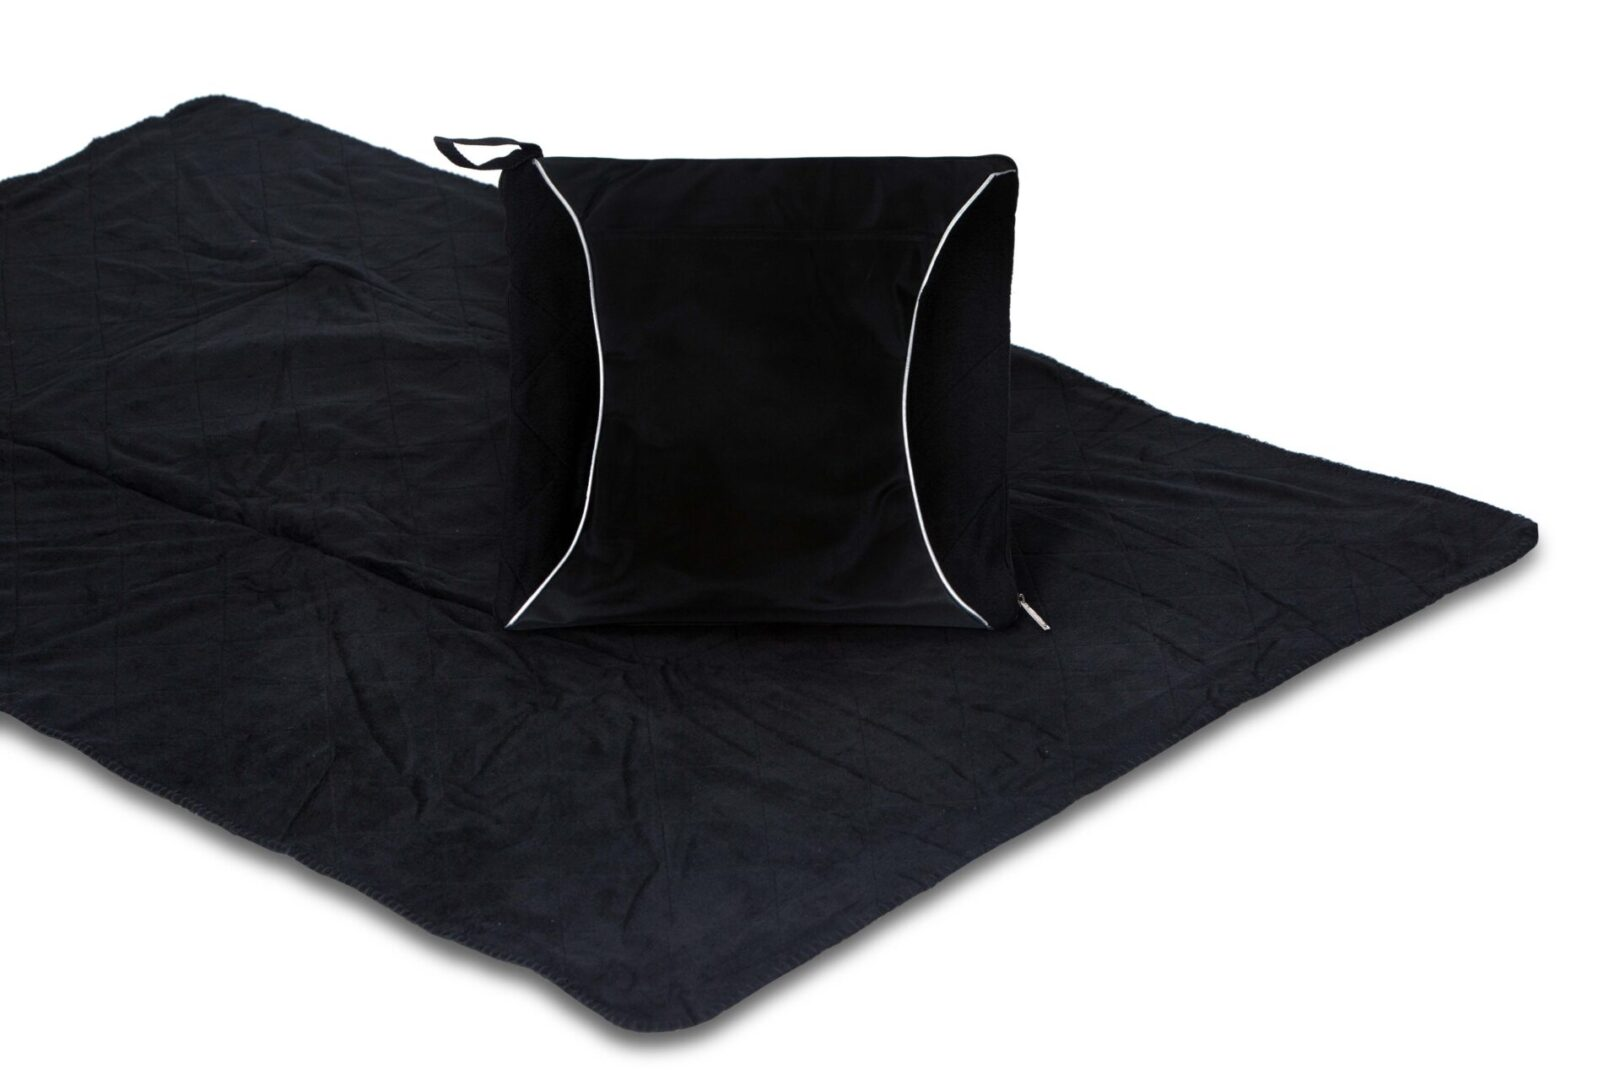 Fleece Blanket Cushion - Black